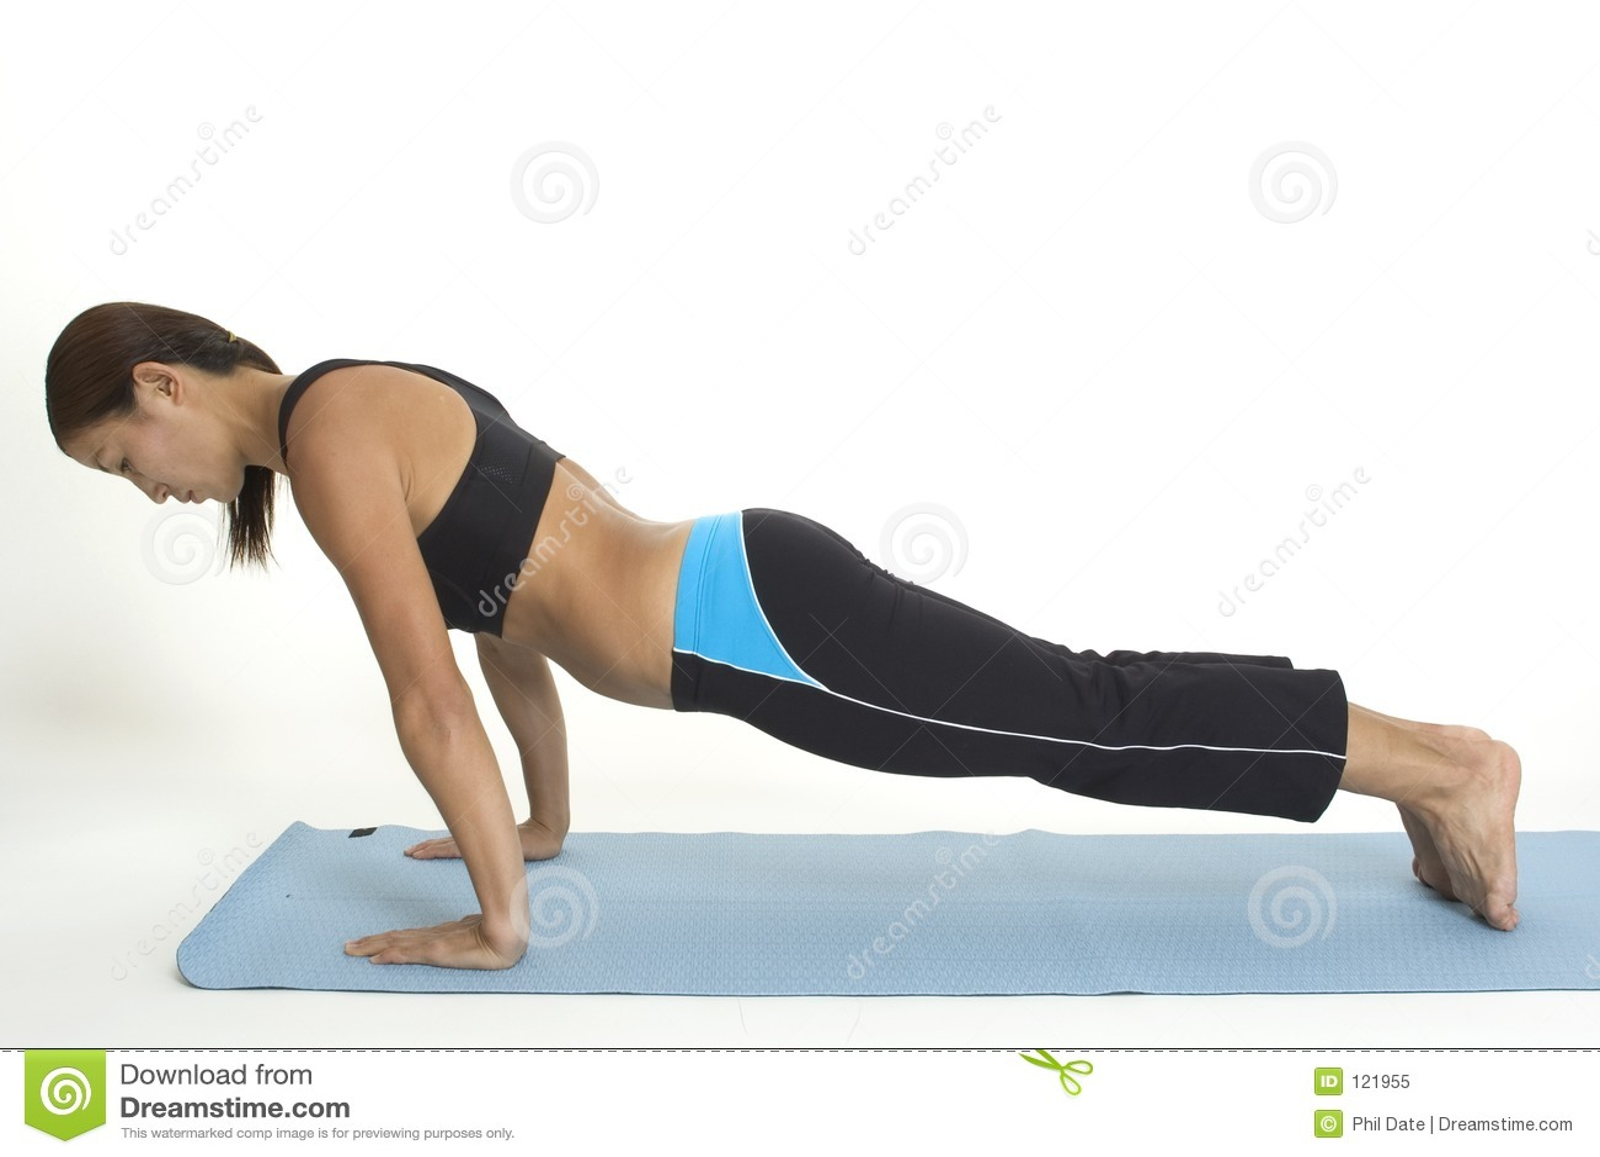 Plank Pose 2 Royalty Free Stock Photo - Image: 121955